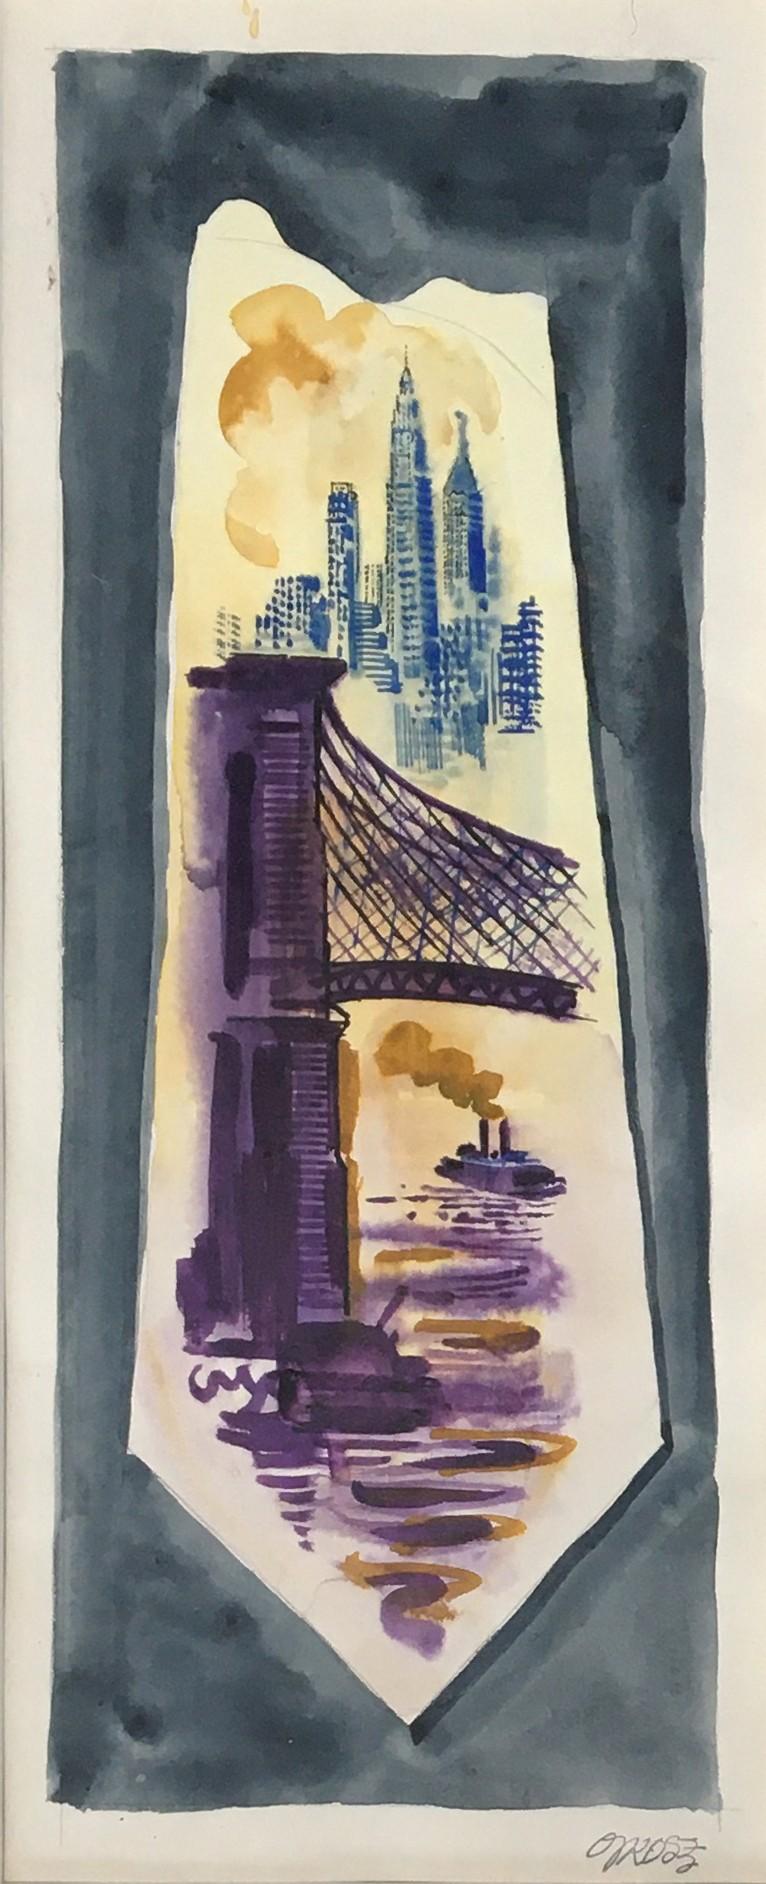 George Grosz (German, 1893-1959), New York necktie (East River), c.1944, watercolour, signed, 50 x